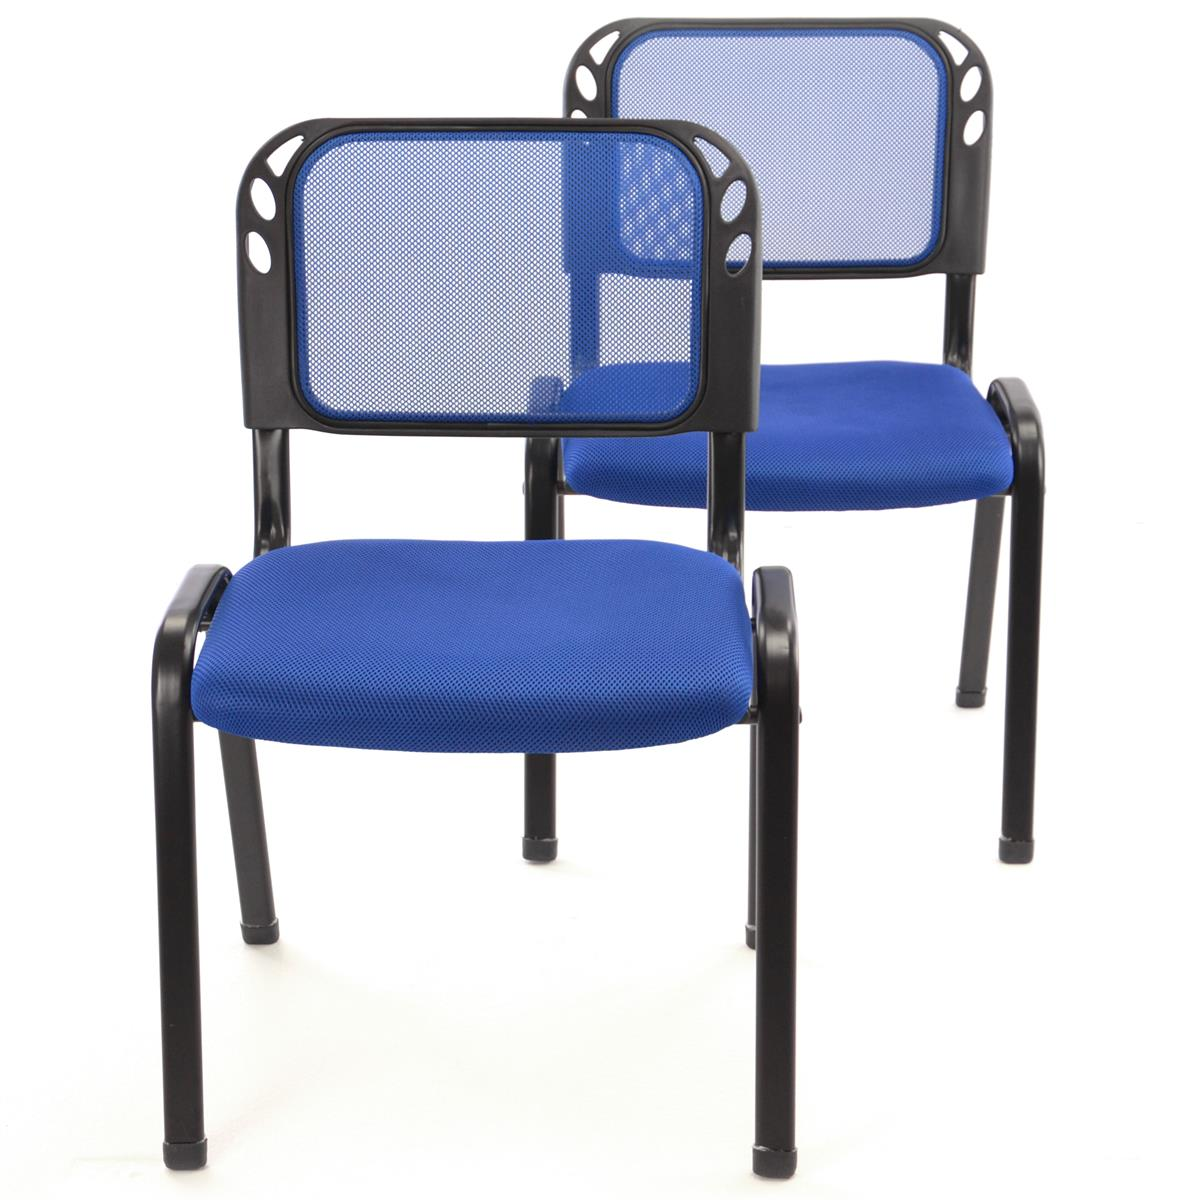 Besucherstuhl 2er Set Bürostuhl Konferenzstuhl Sitzfläche Blau gepolstert